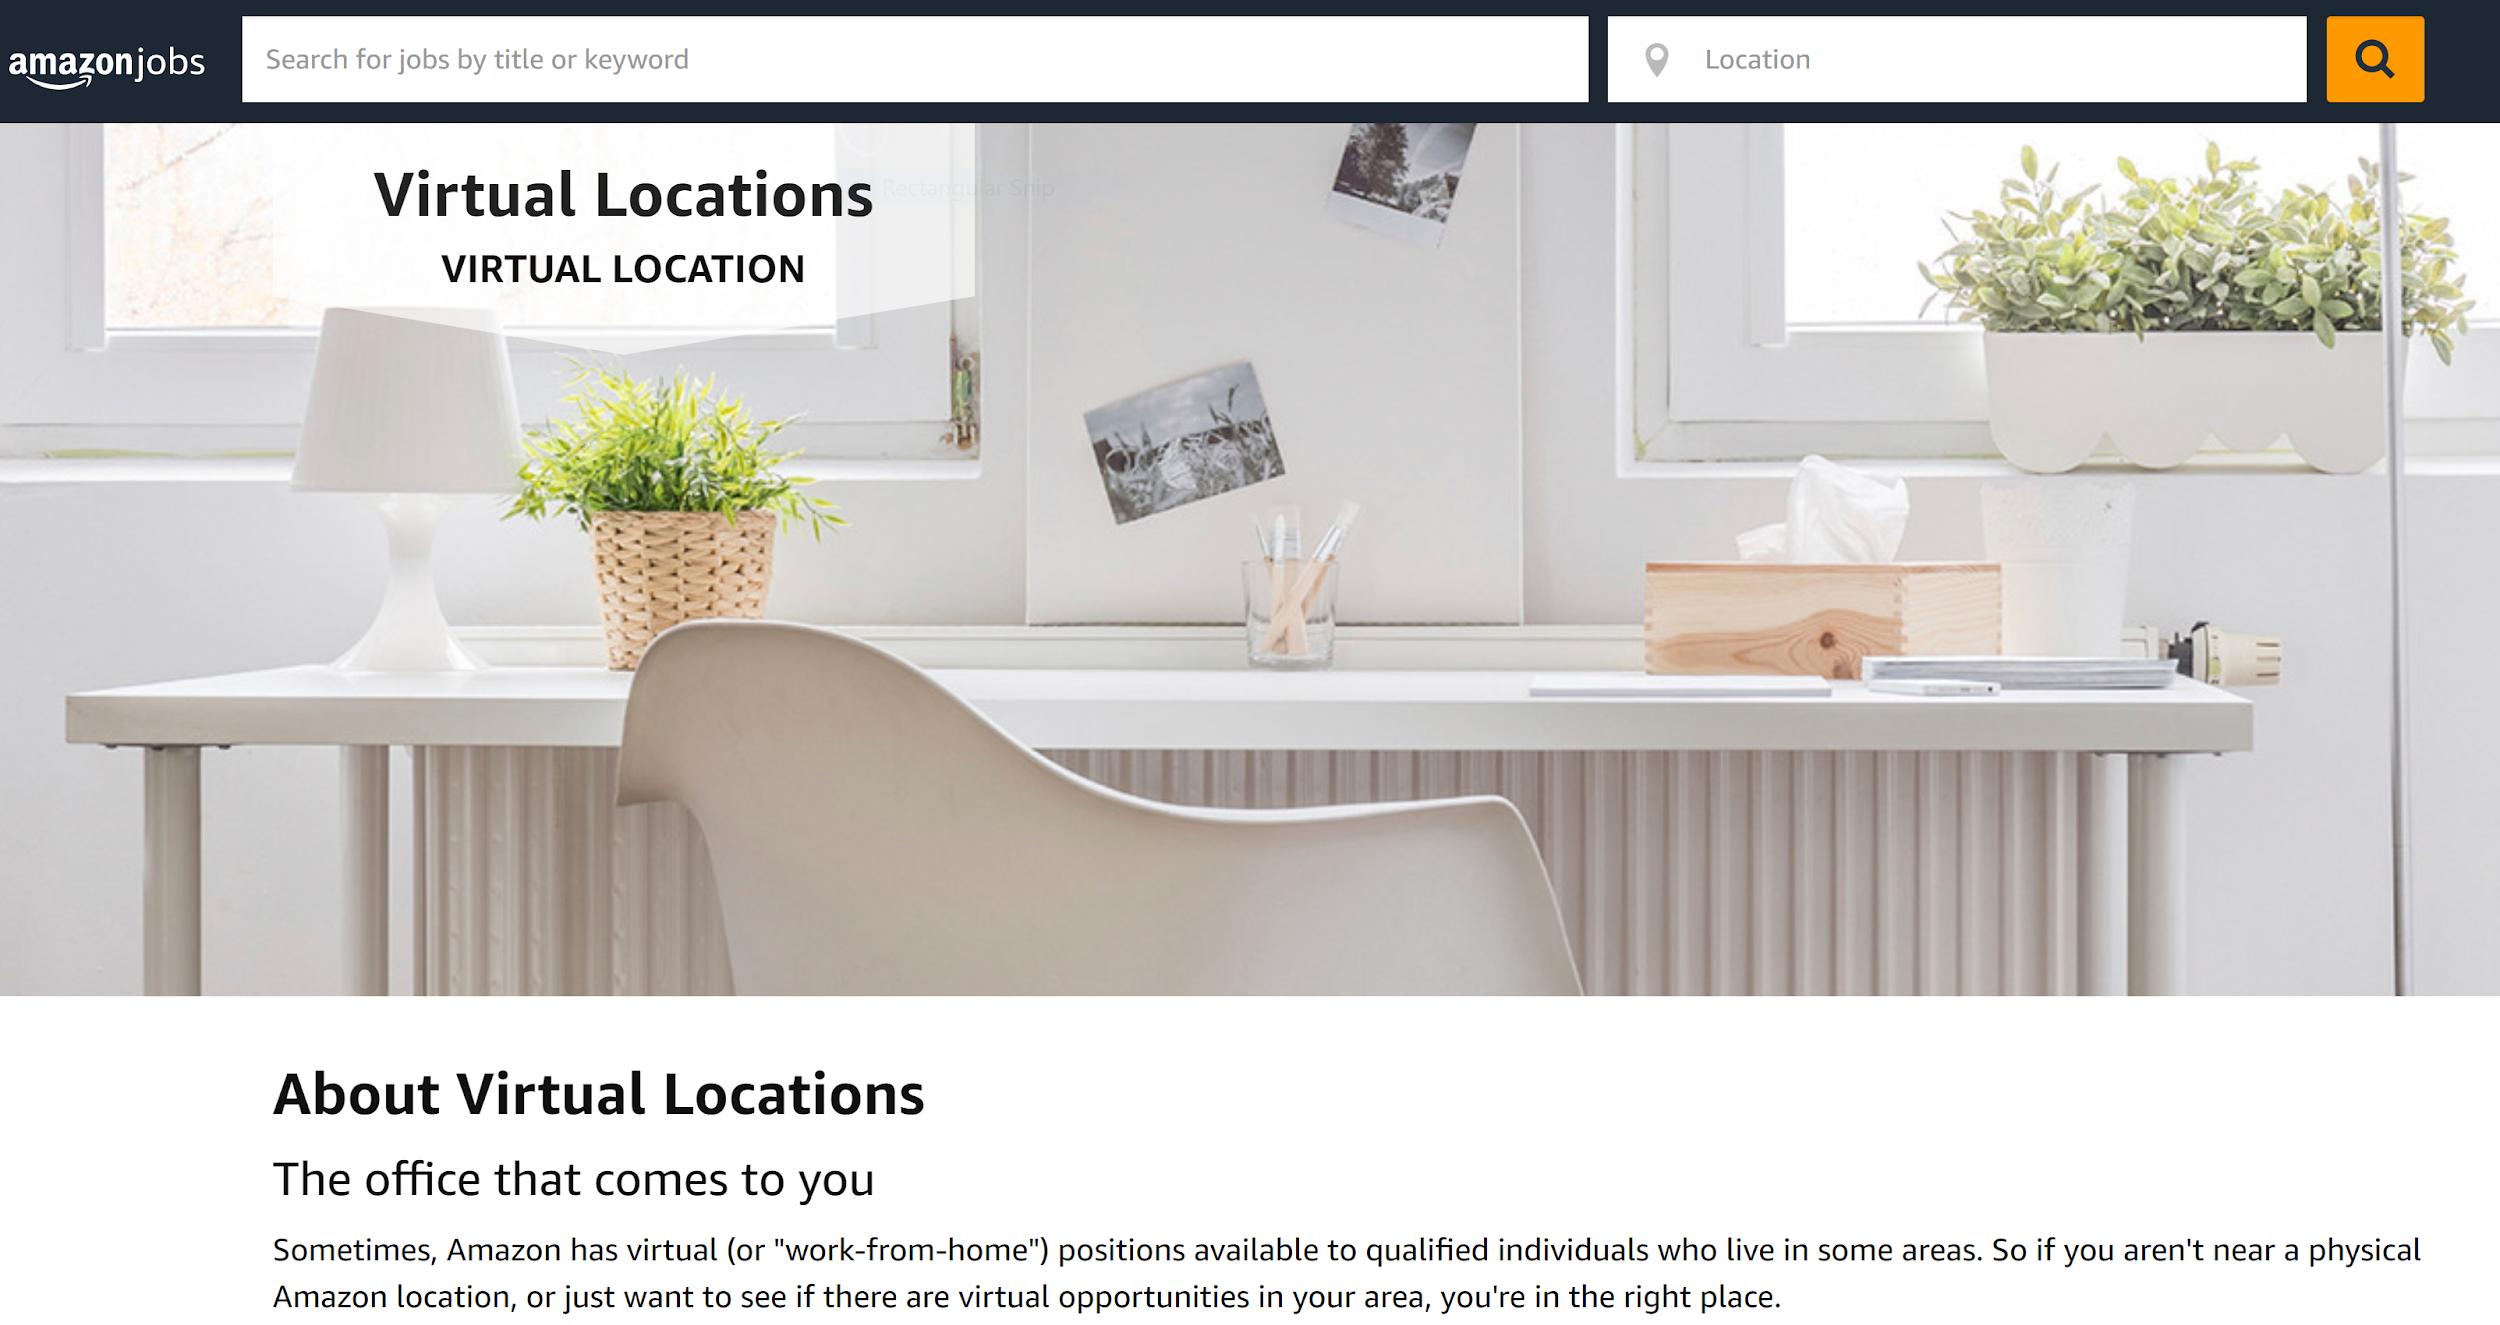 Amazon Virtual Location Page